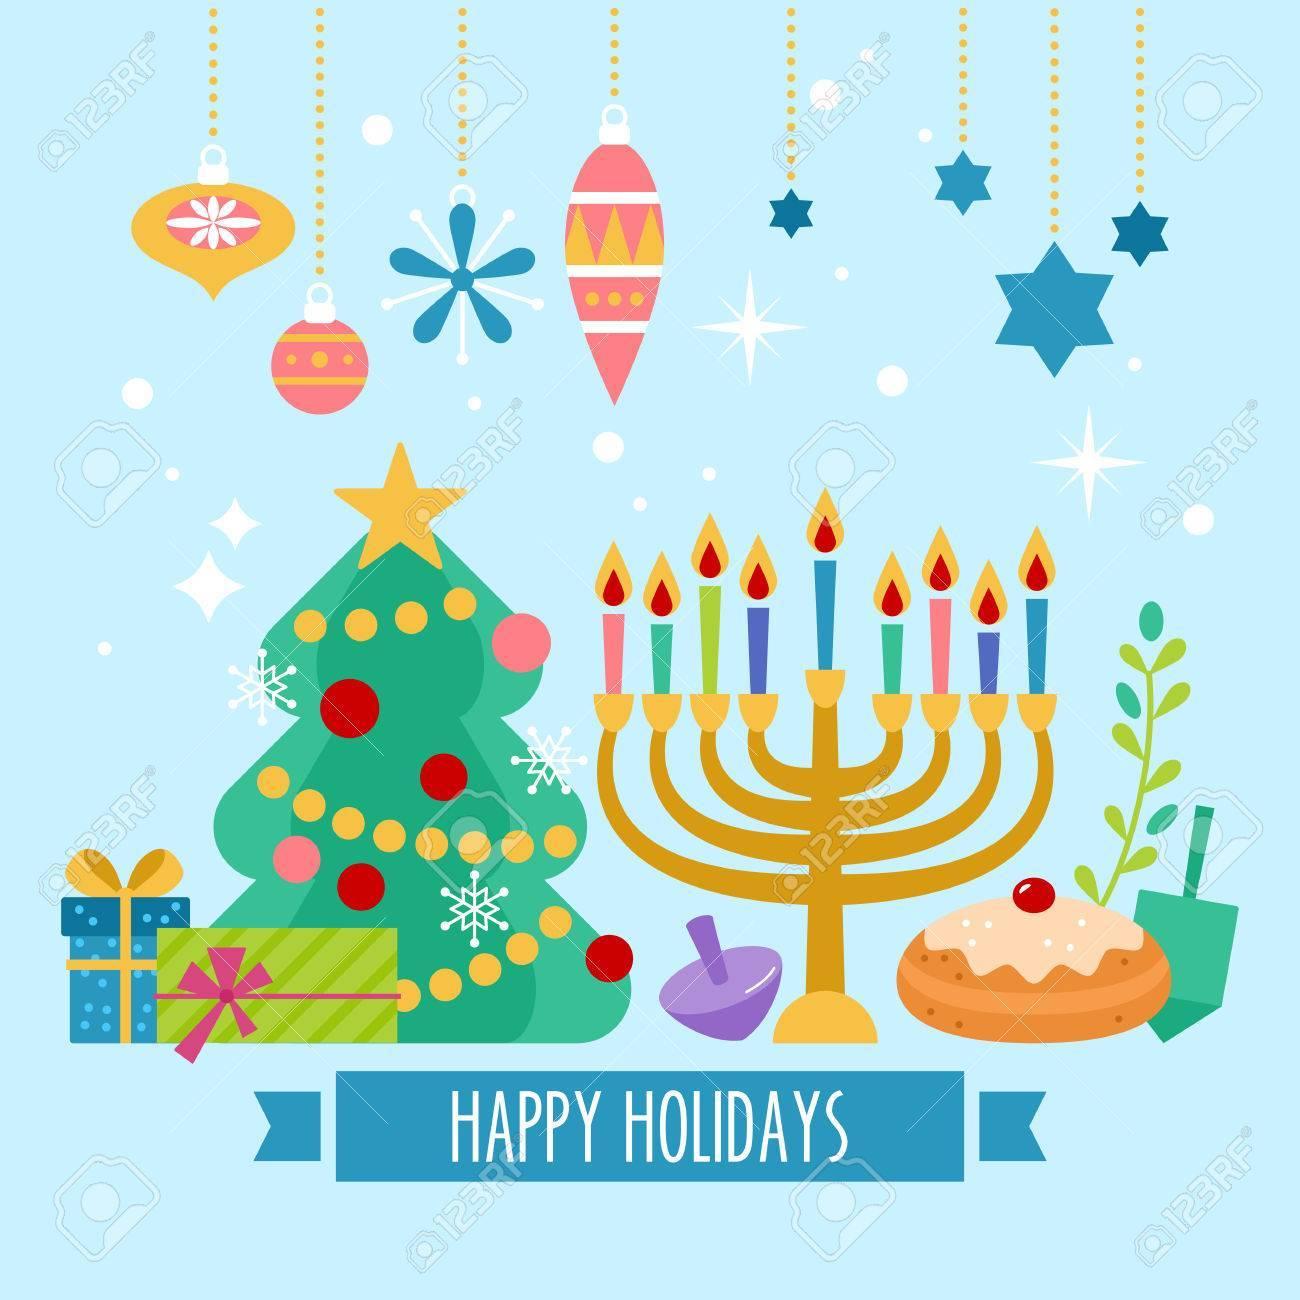 Christmas and Hanukkah holiday banner design » Clipart Portal.